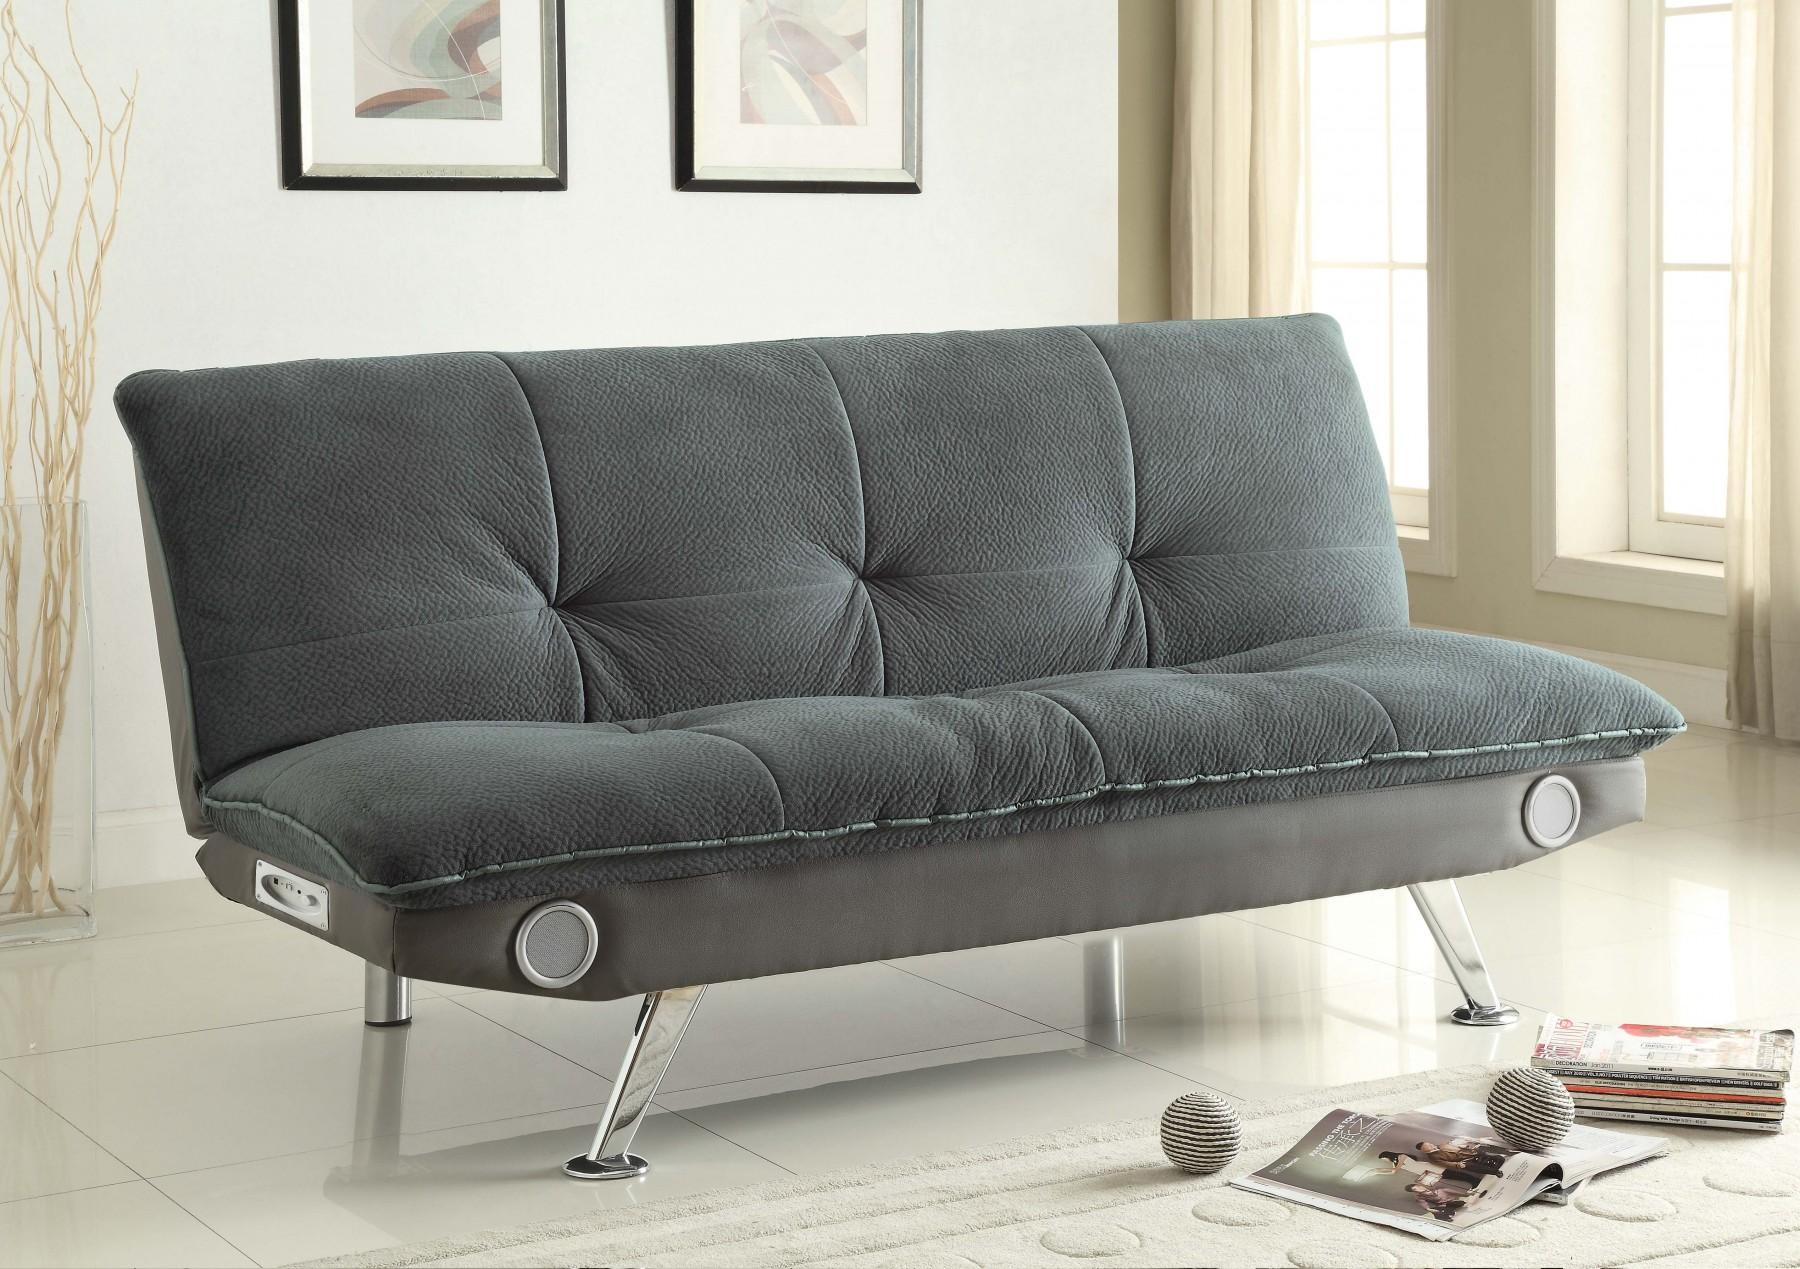 grey futon sofa bed walmart com